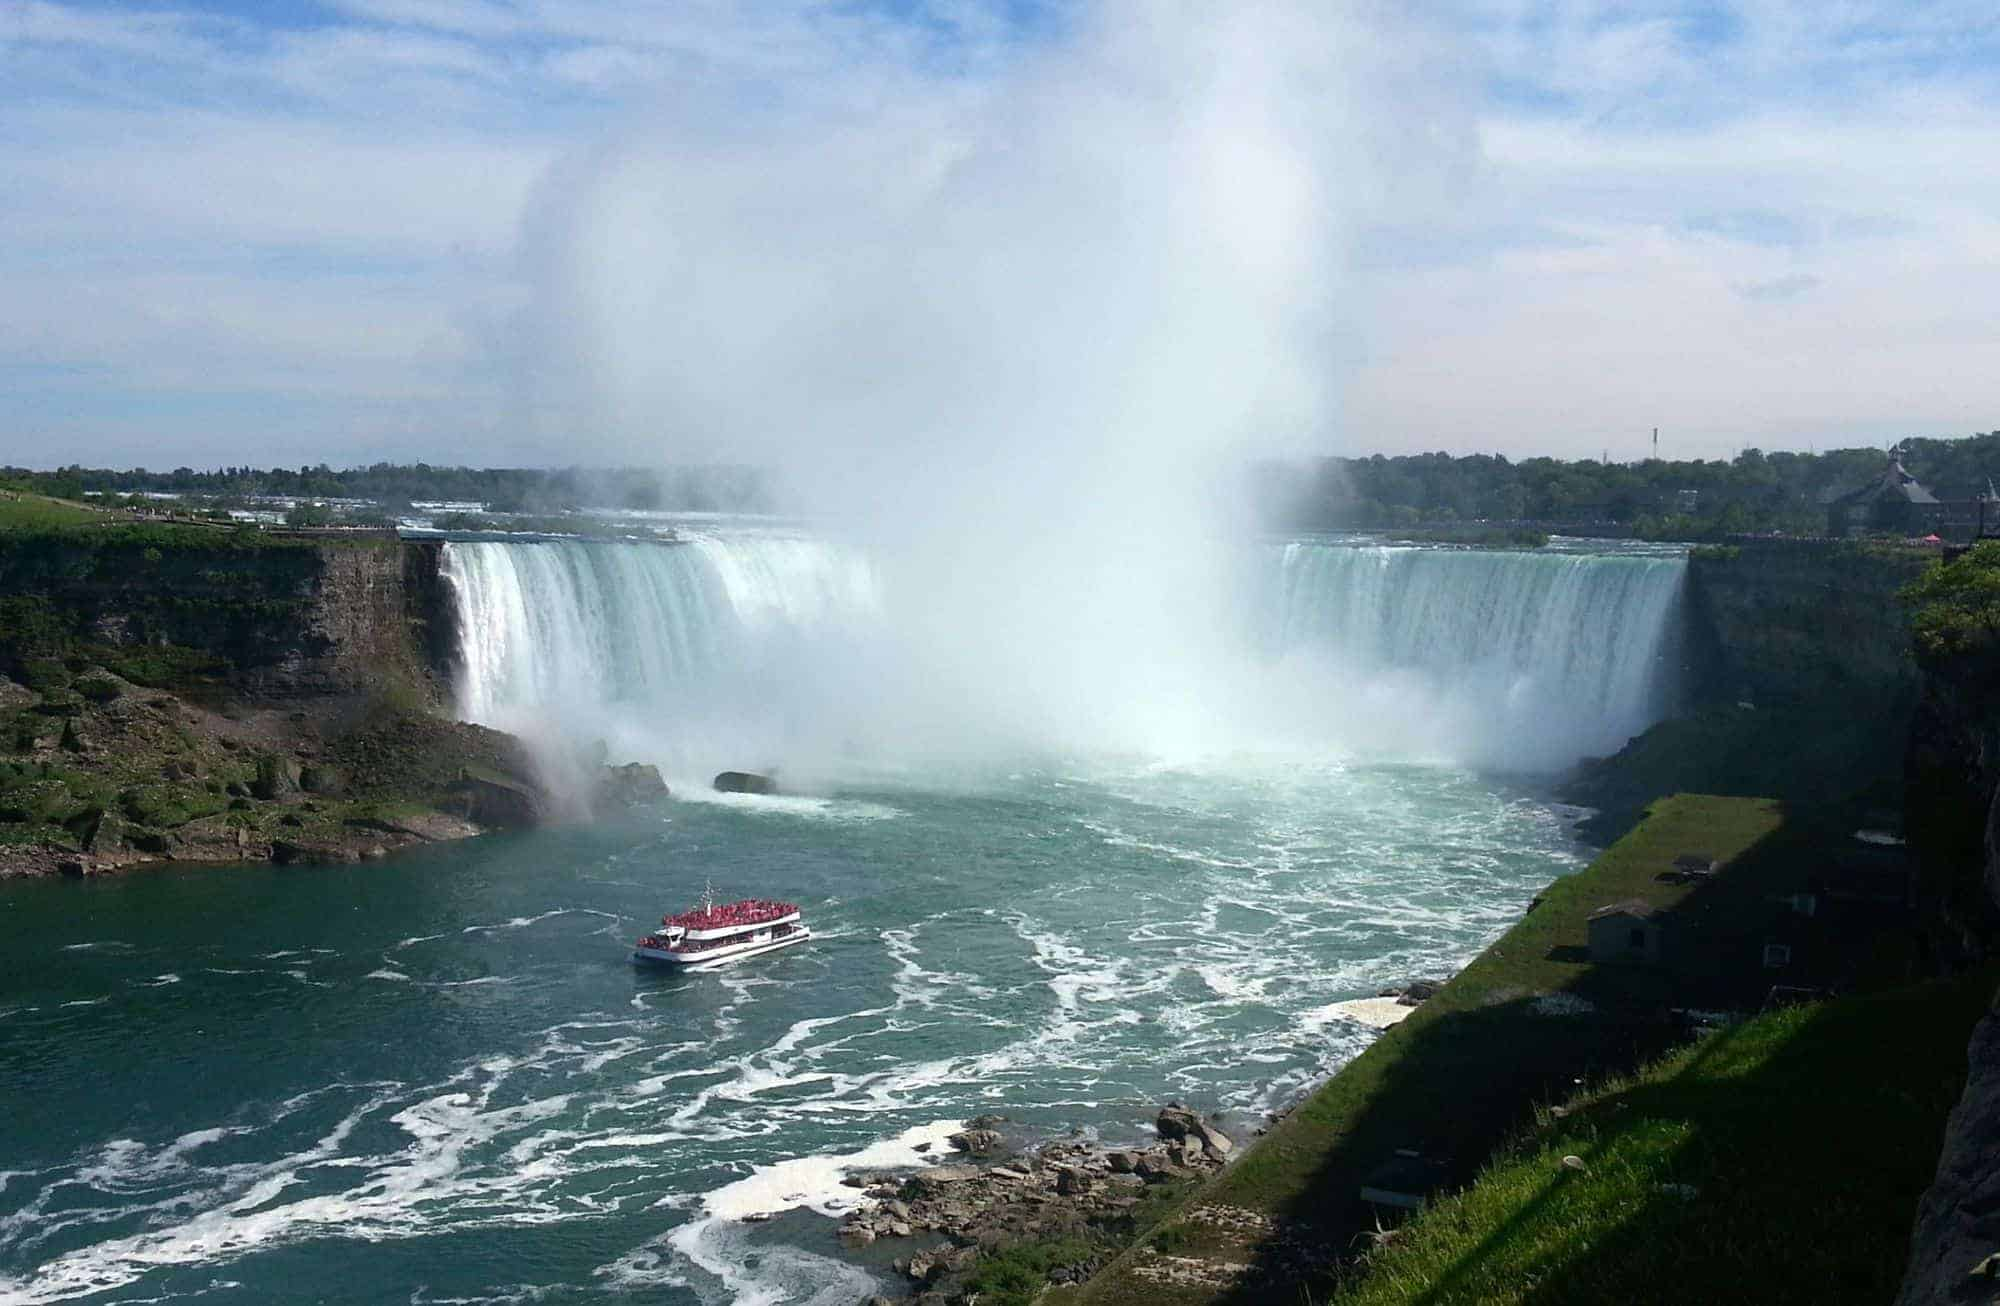 Family and Budget Friendly Niagara Falls Hotel – Howard Johnson By The Falls Review